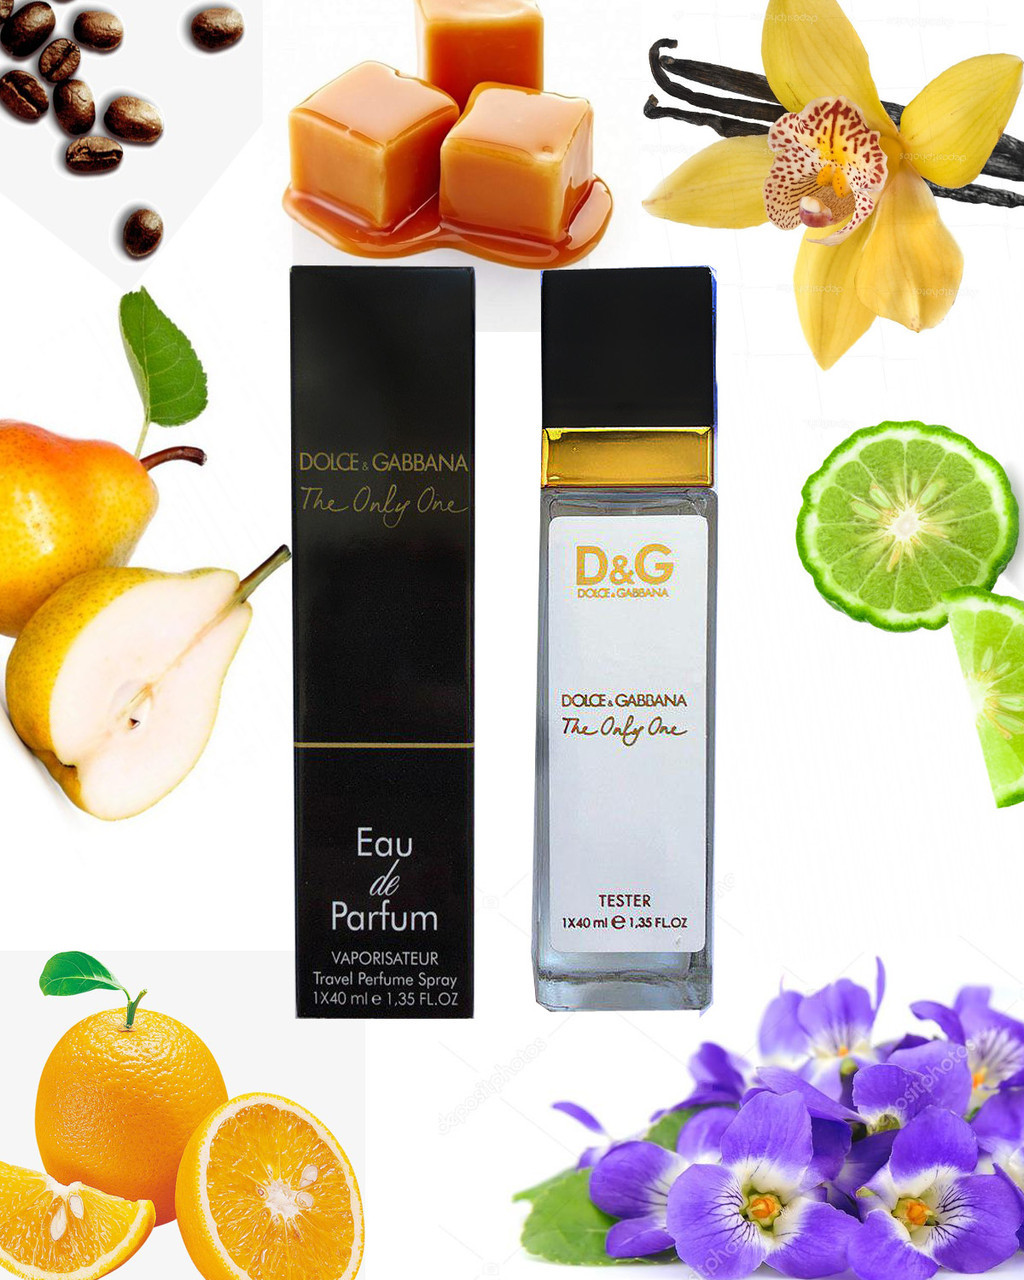 Dolce & Gabbana The Only One eau de parfum тестер 40 мл